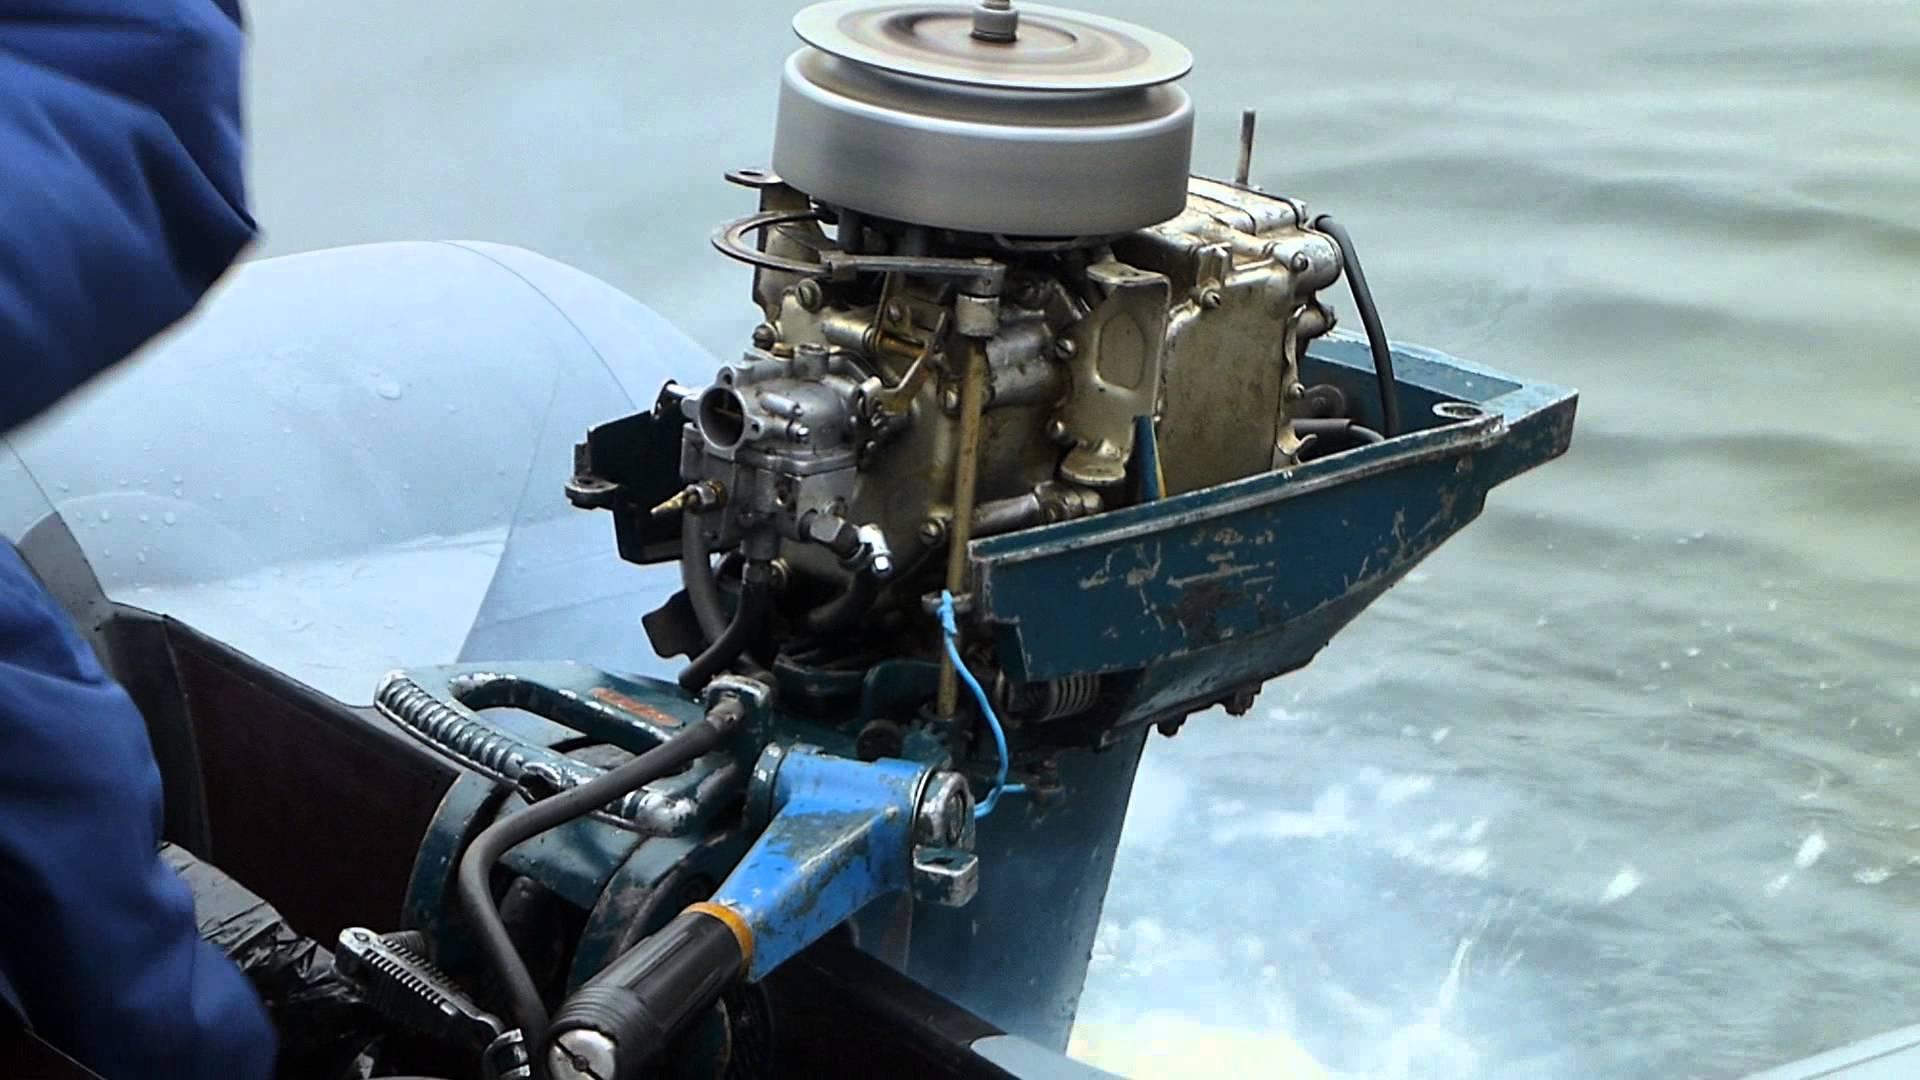 стакан в лодочном моторе